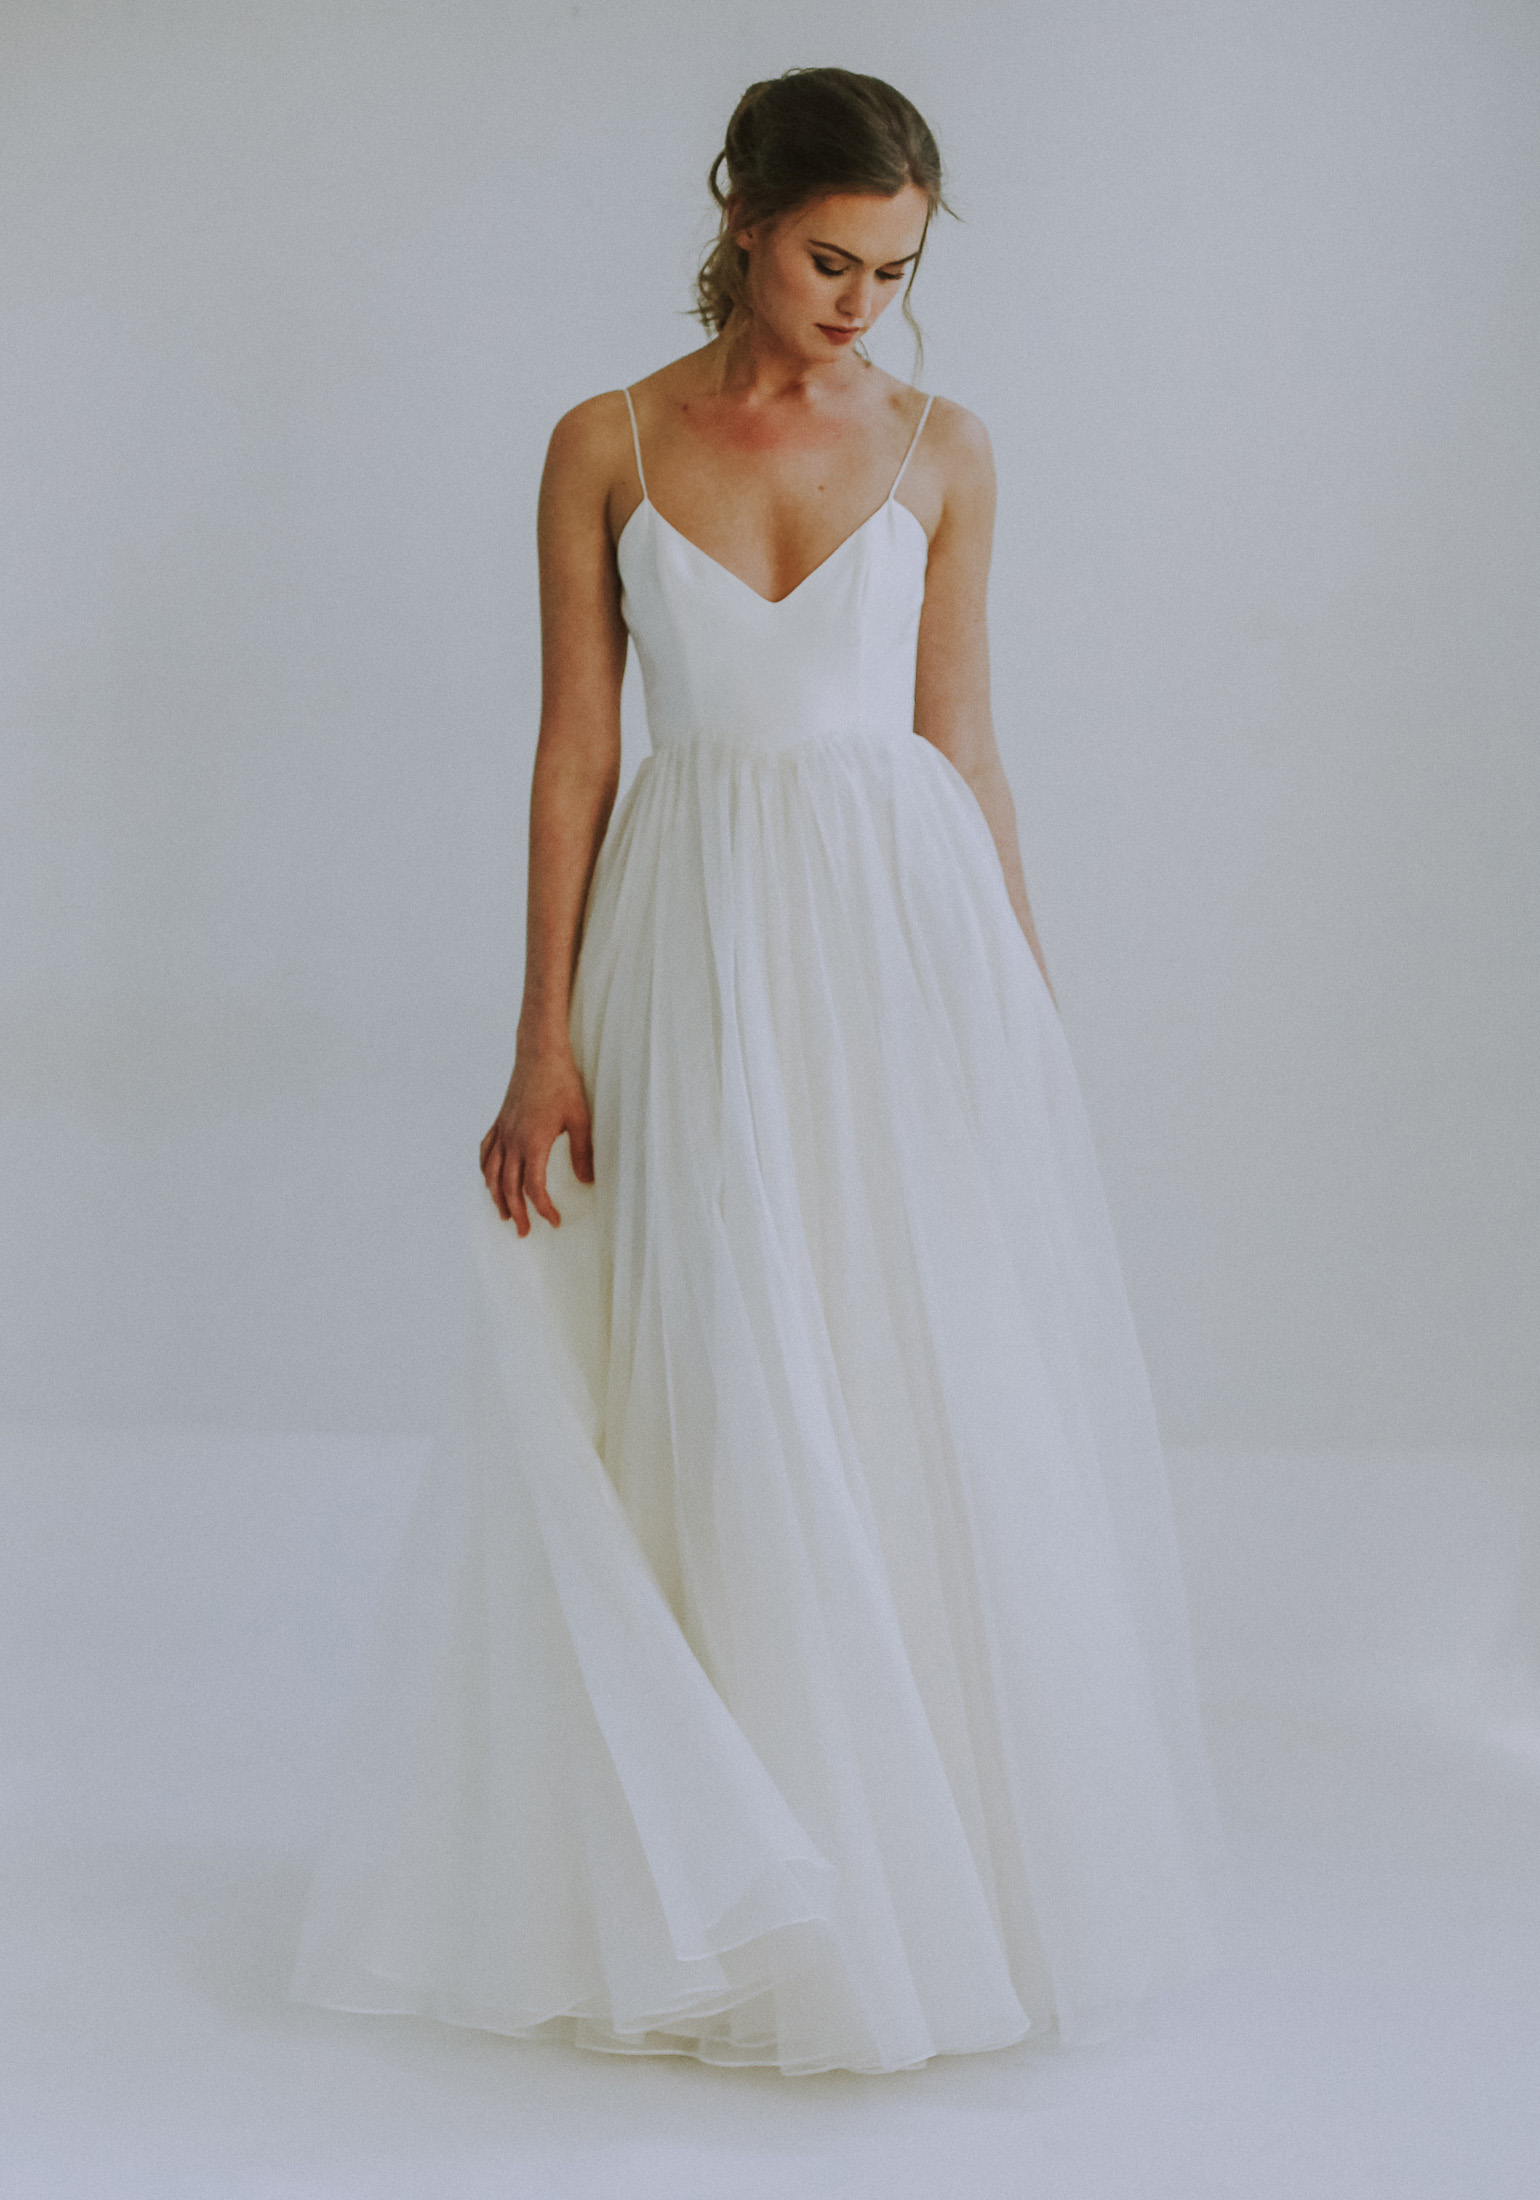 Laurel Leanne Marshall A Line Wedding Dress Wedding Dresses Simple Bridal Gowns